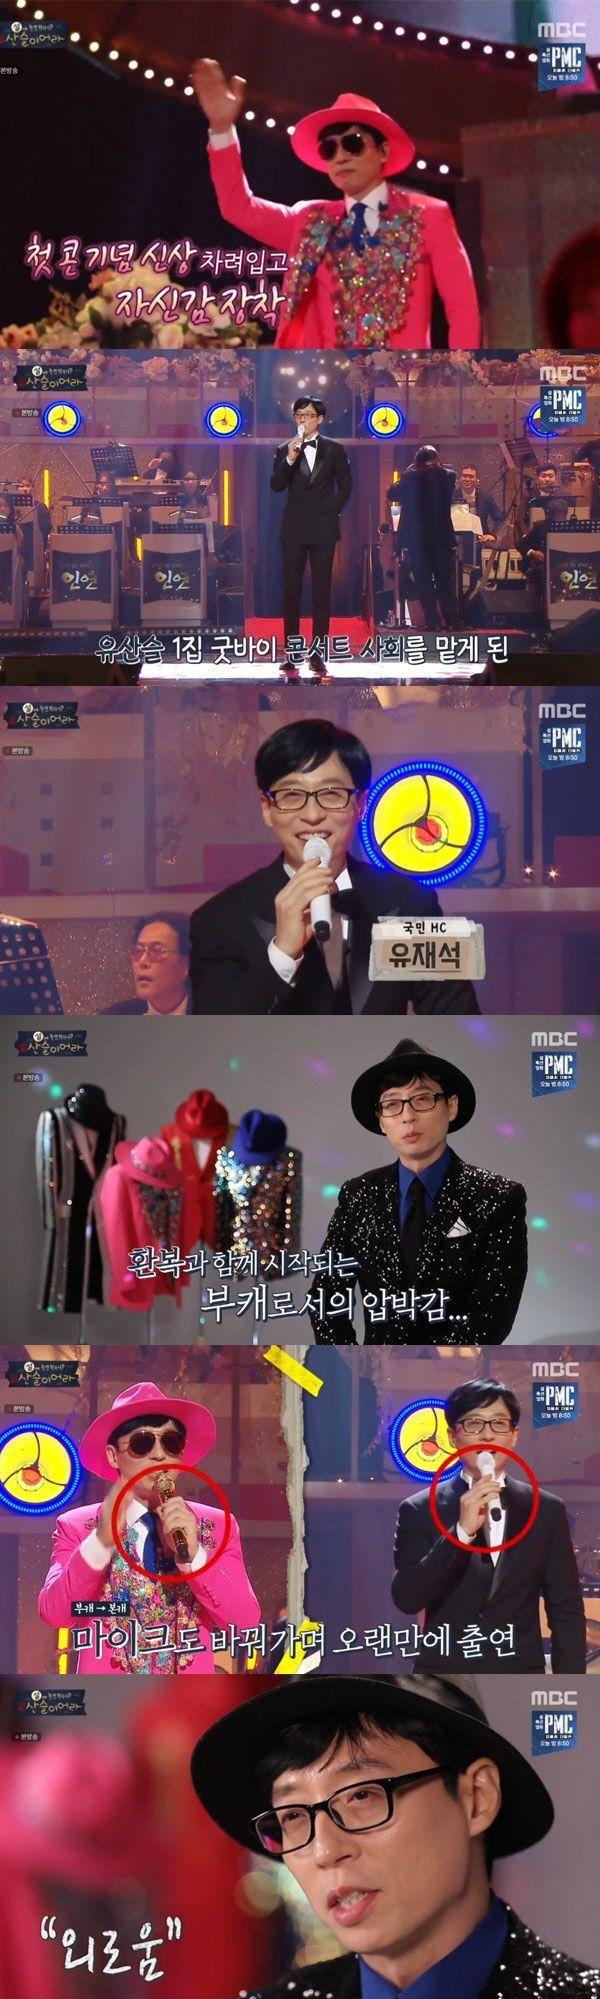 MBC '놀면 뭐하니' 방송인 유재석 / 사진=MBC